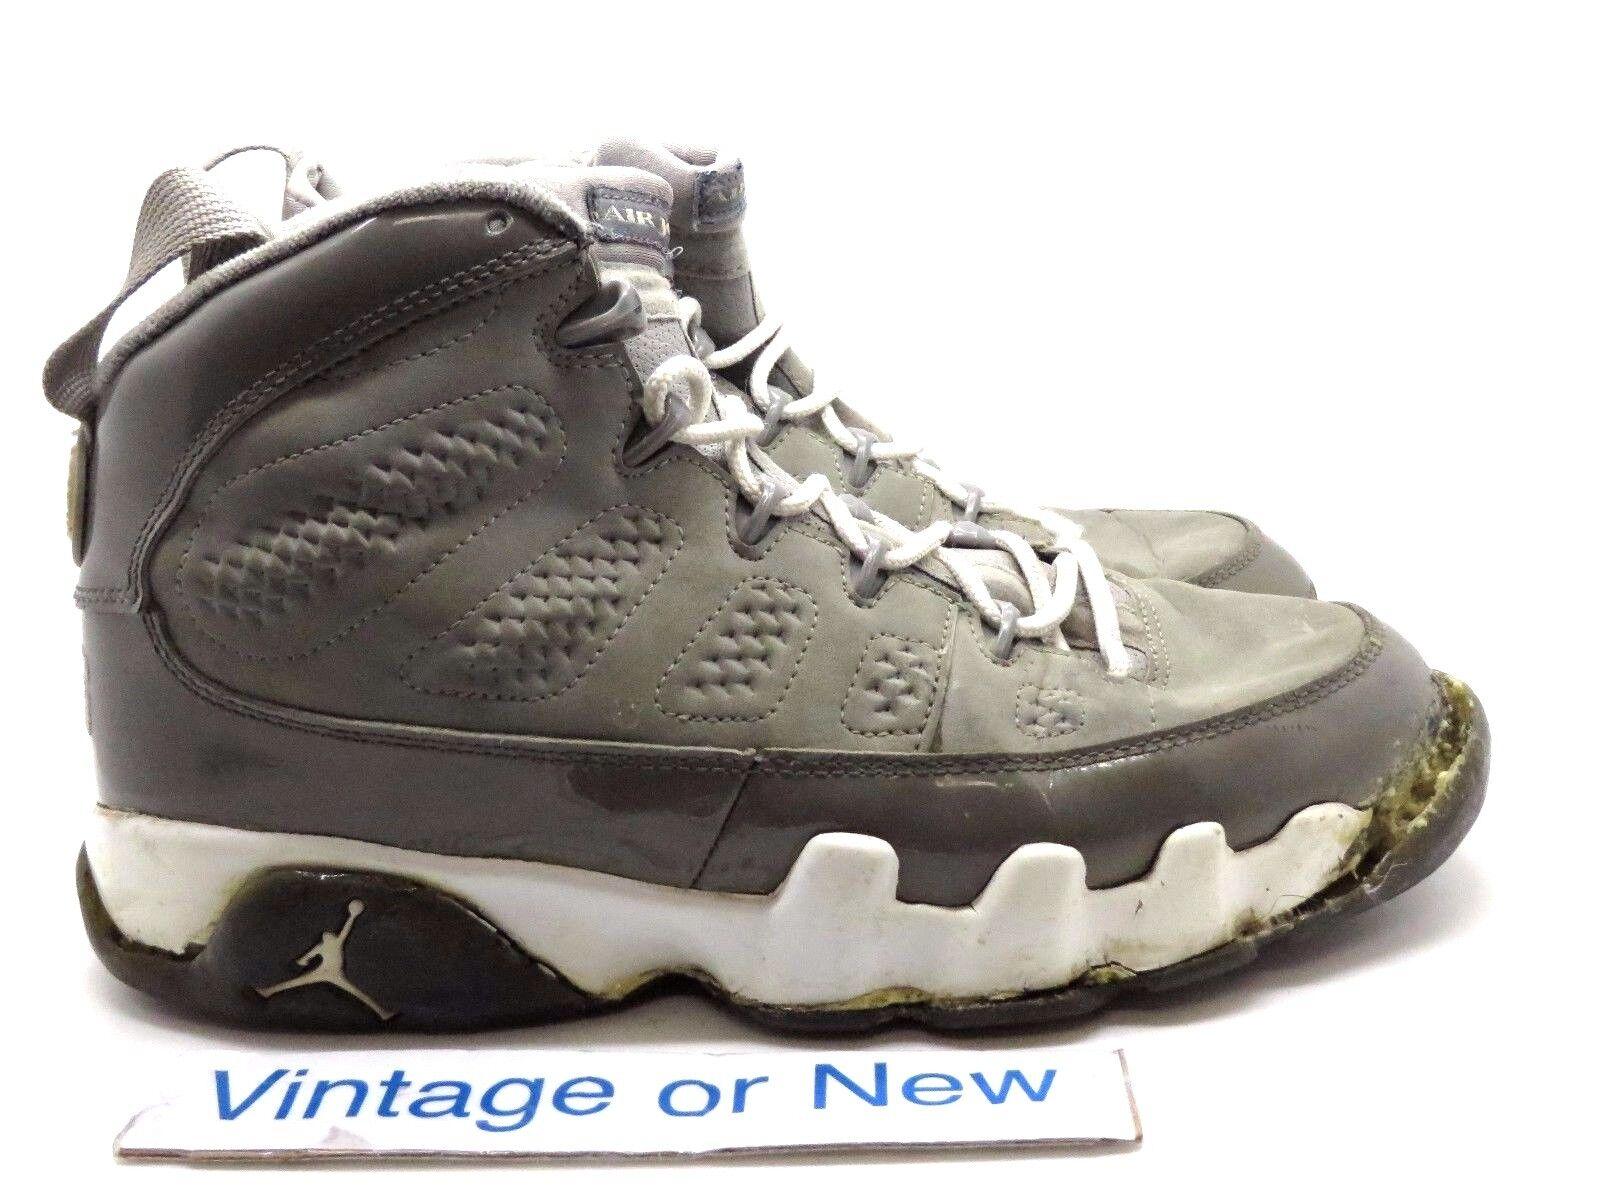 VTG Air Jordan IX 9 Cool Grey Retro 2002 Price reduction Cheap and beautiful fashion